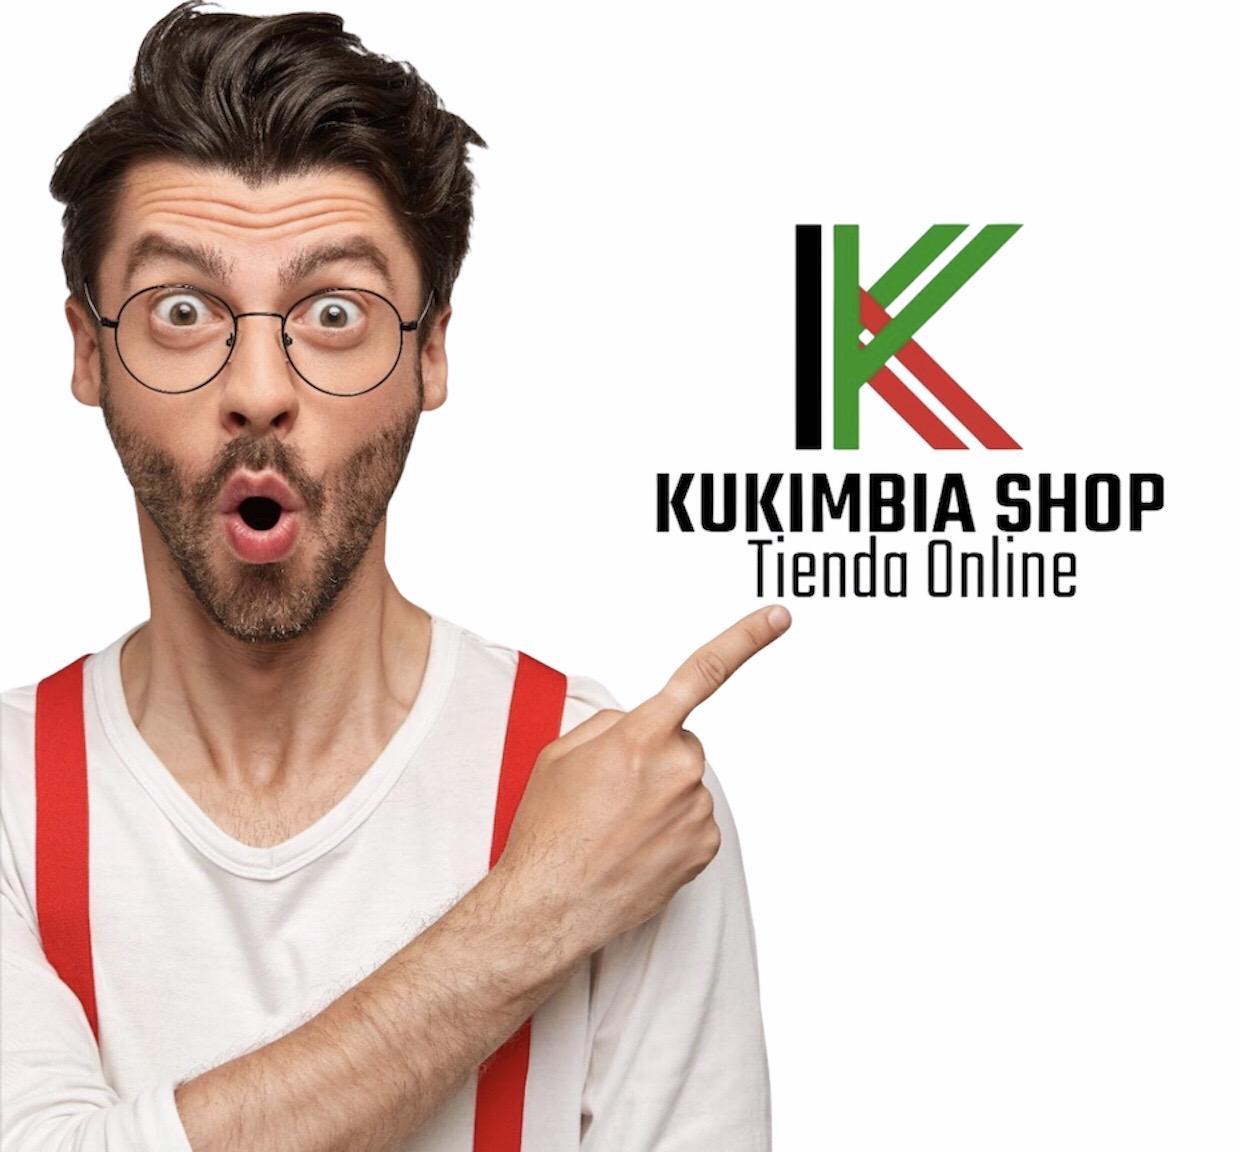 226ERS · PEDIDO · kUKIMBIA SHOP - TIENDA ONLINE